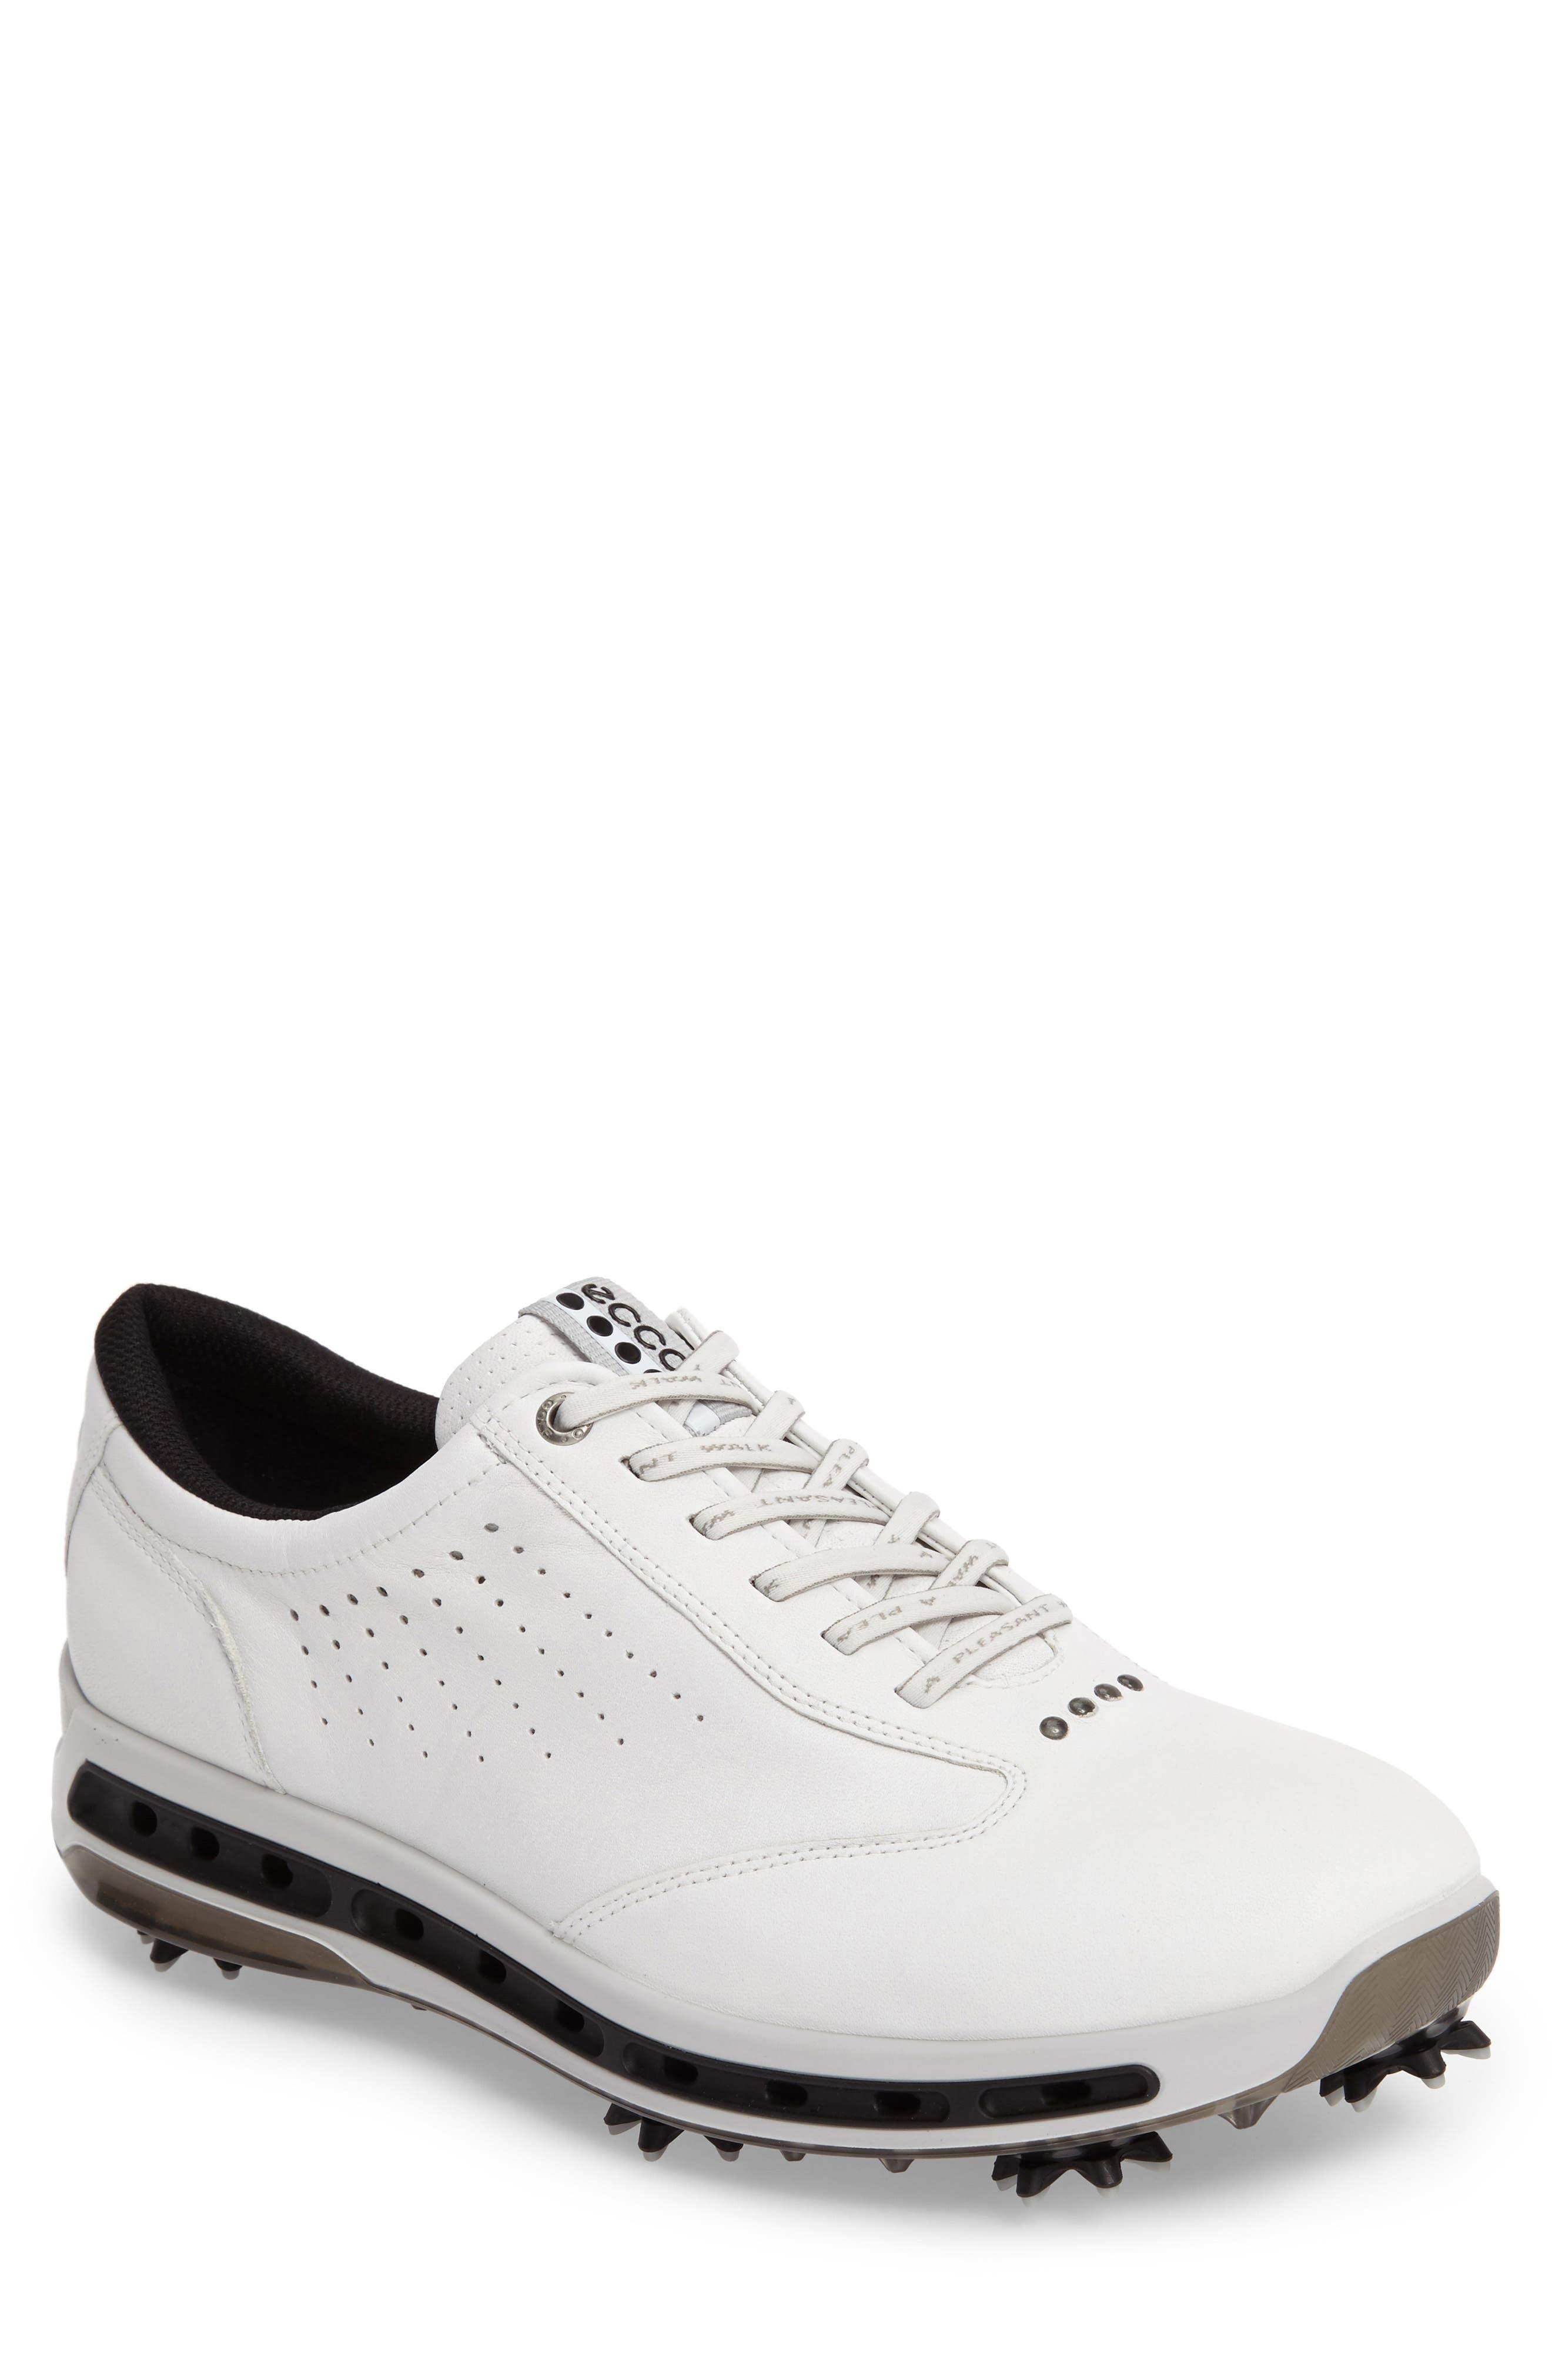 Main Image - ECCO Cool GTX Golf Shoe (Men)